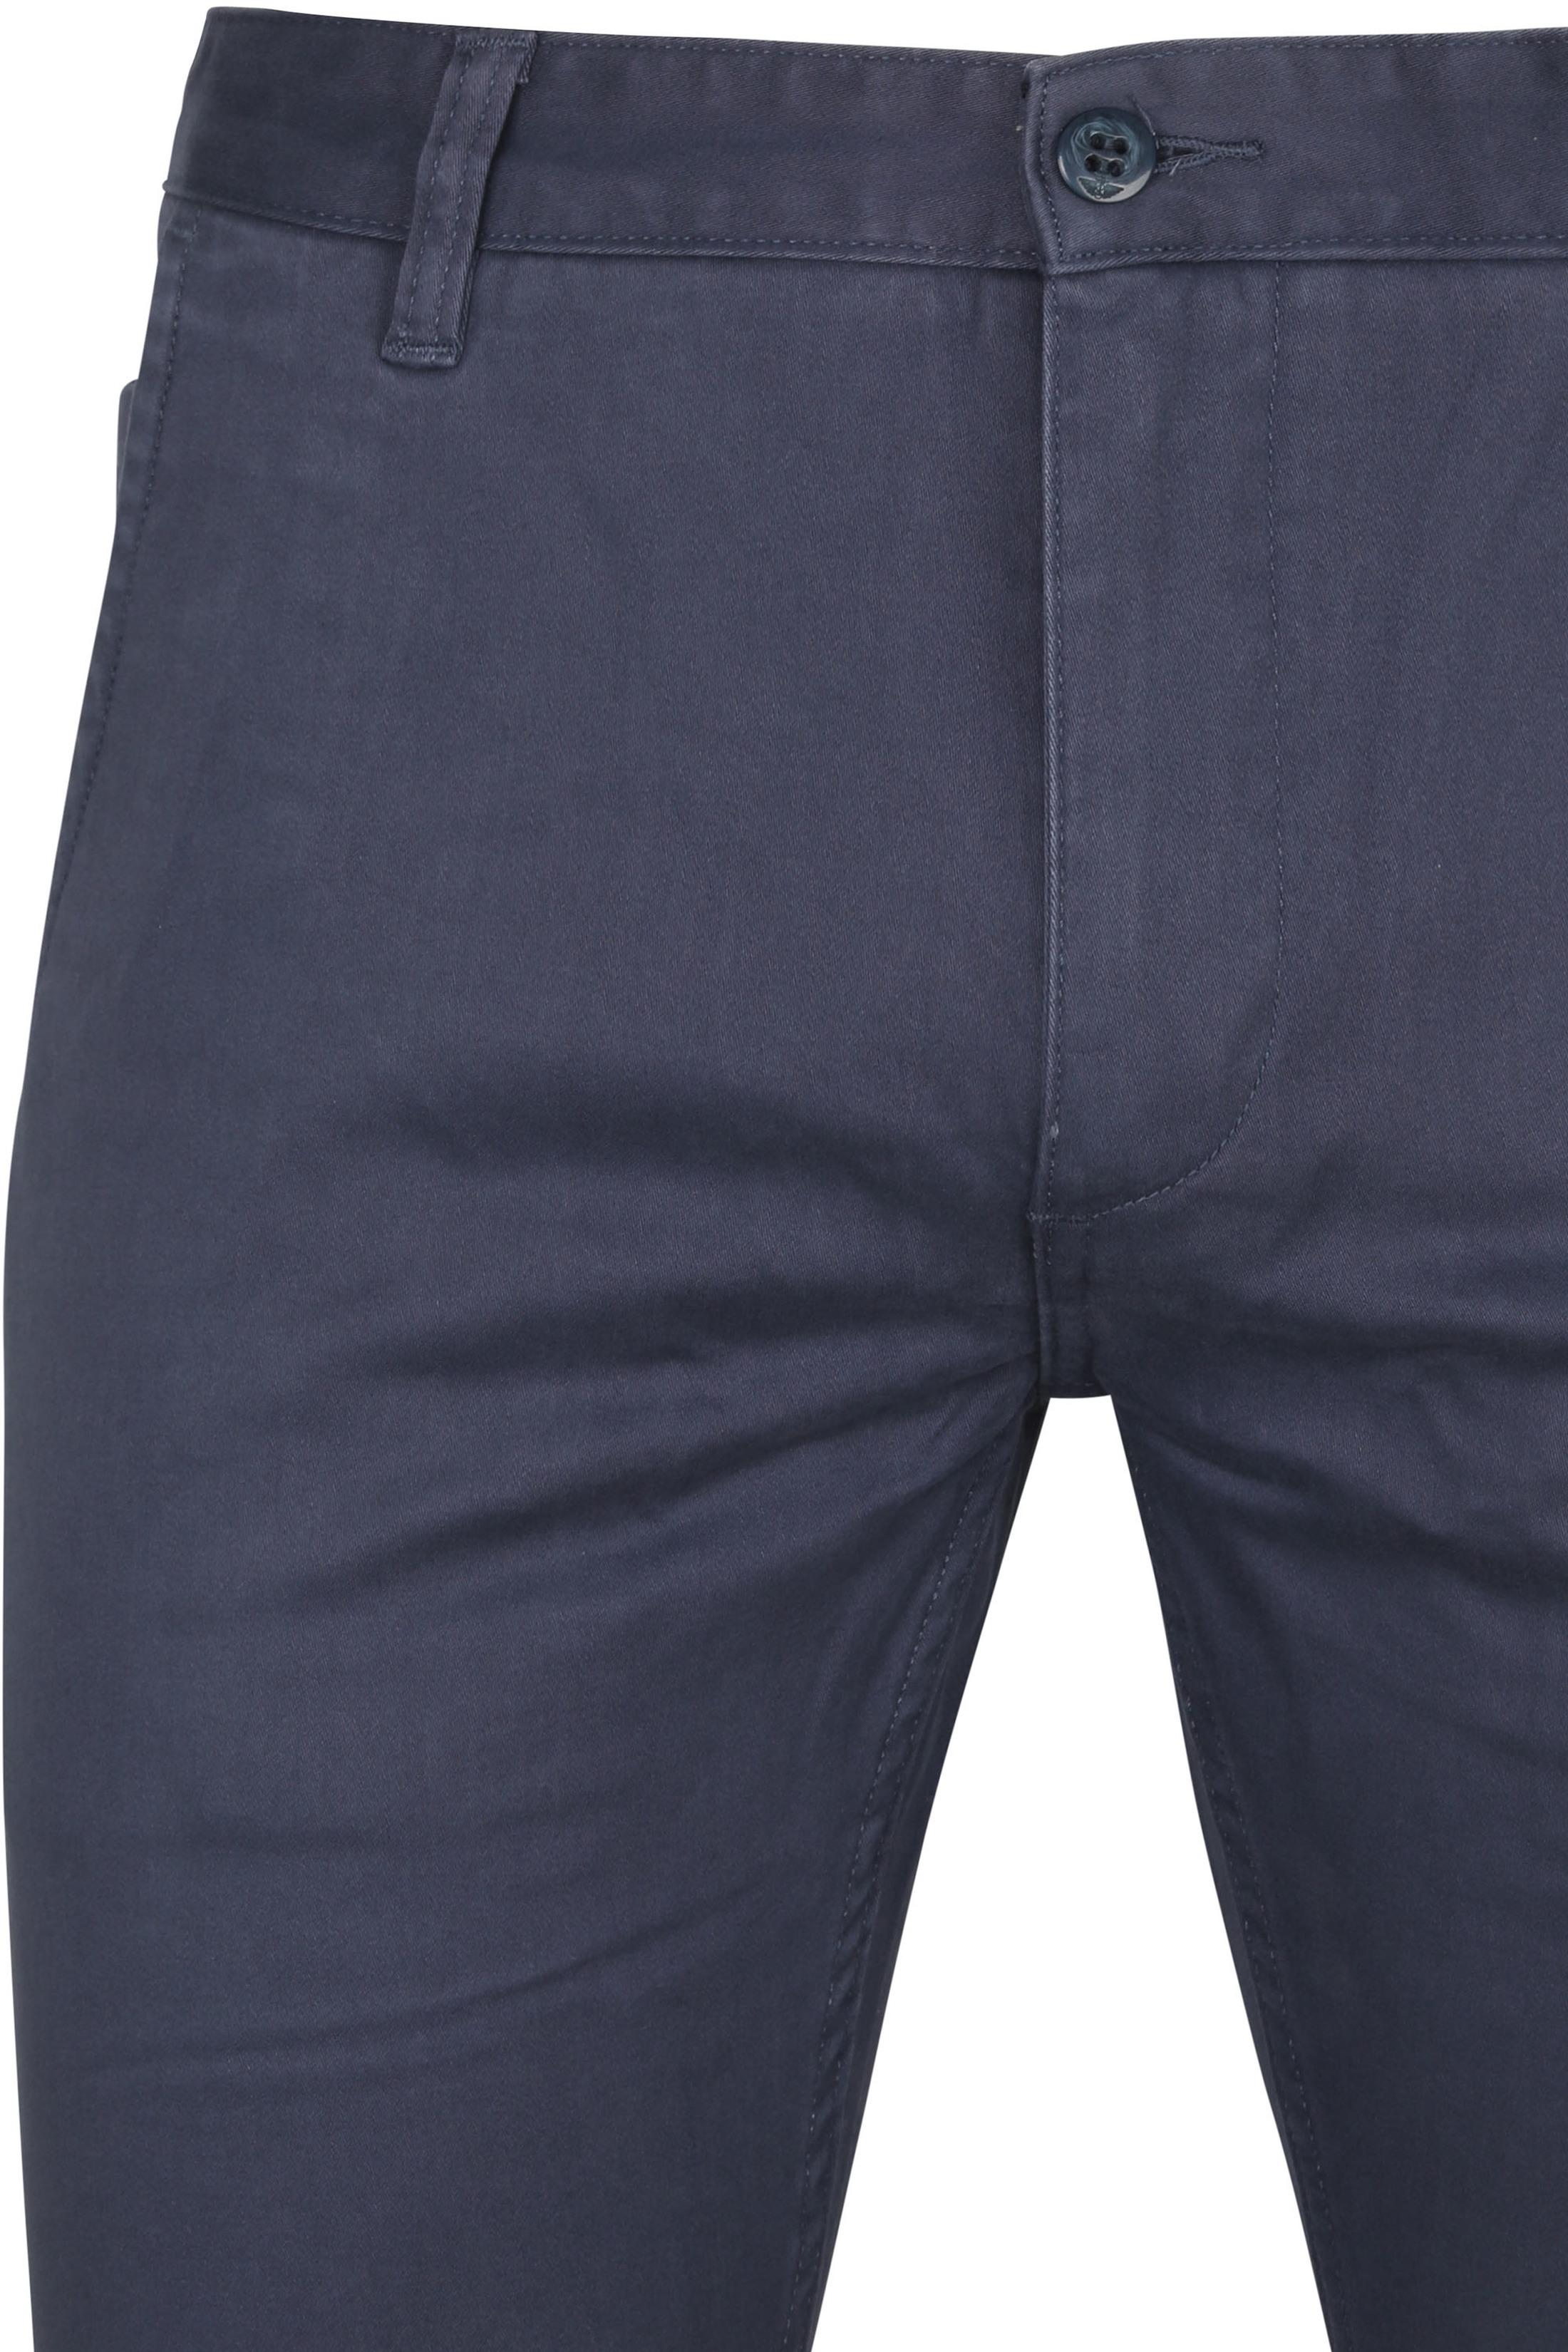 Dockers Alpha Skinny Chino Blue